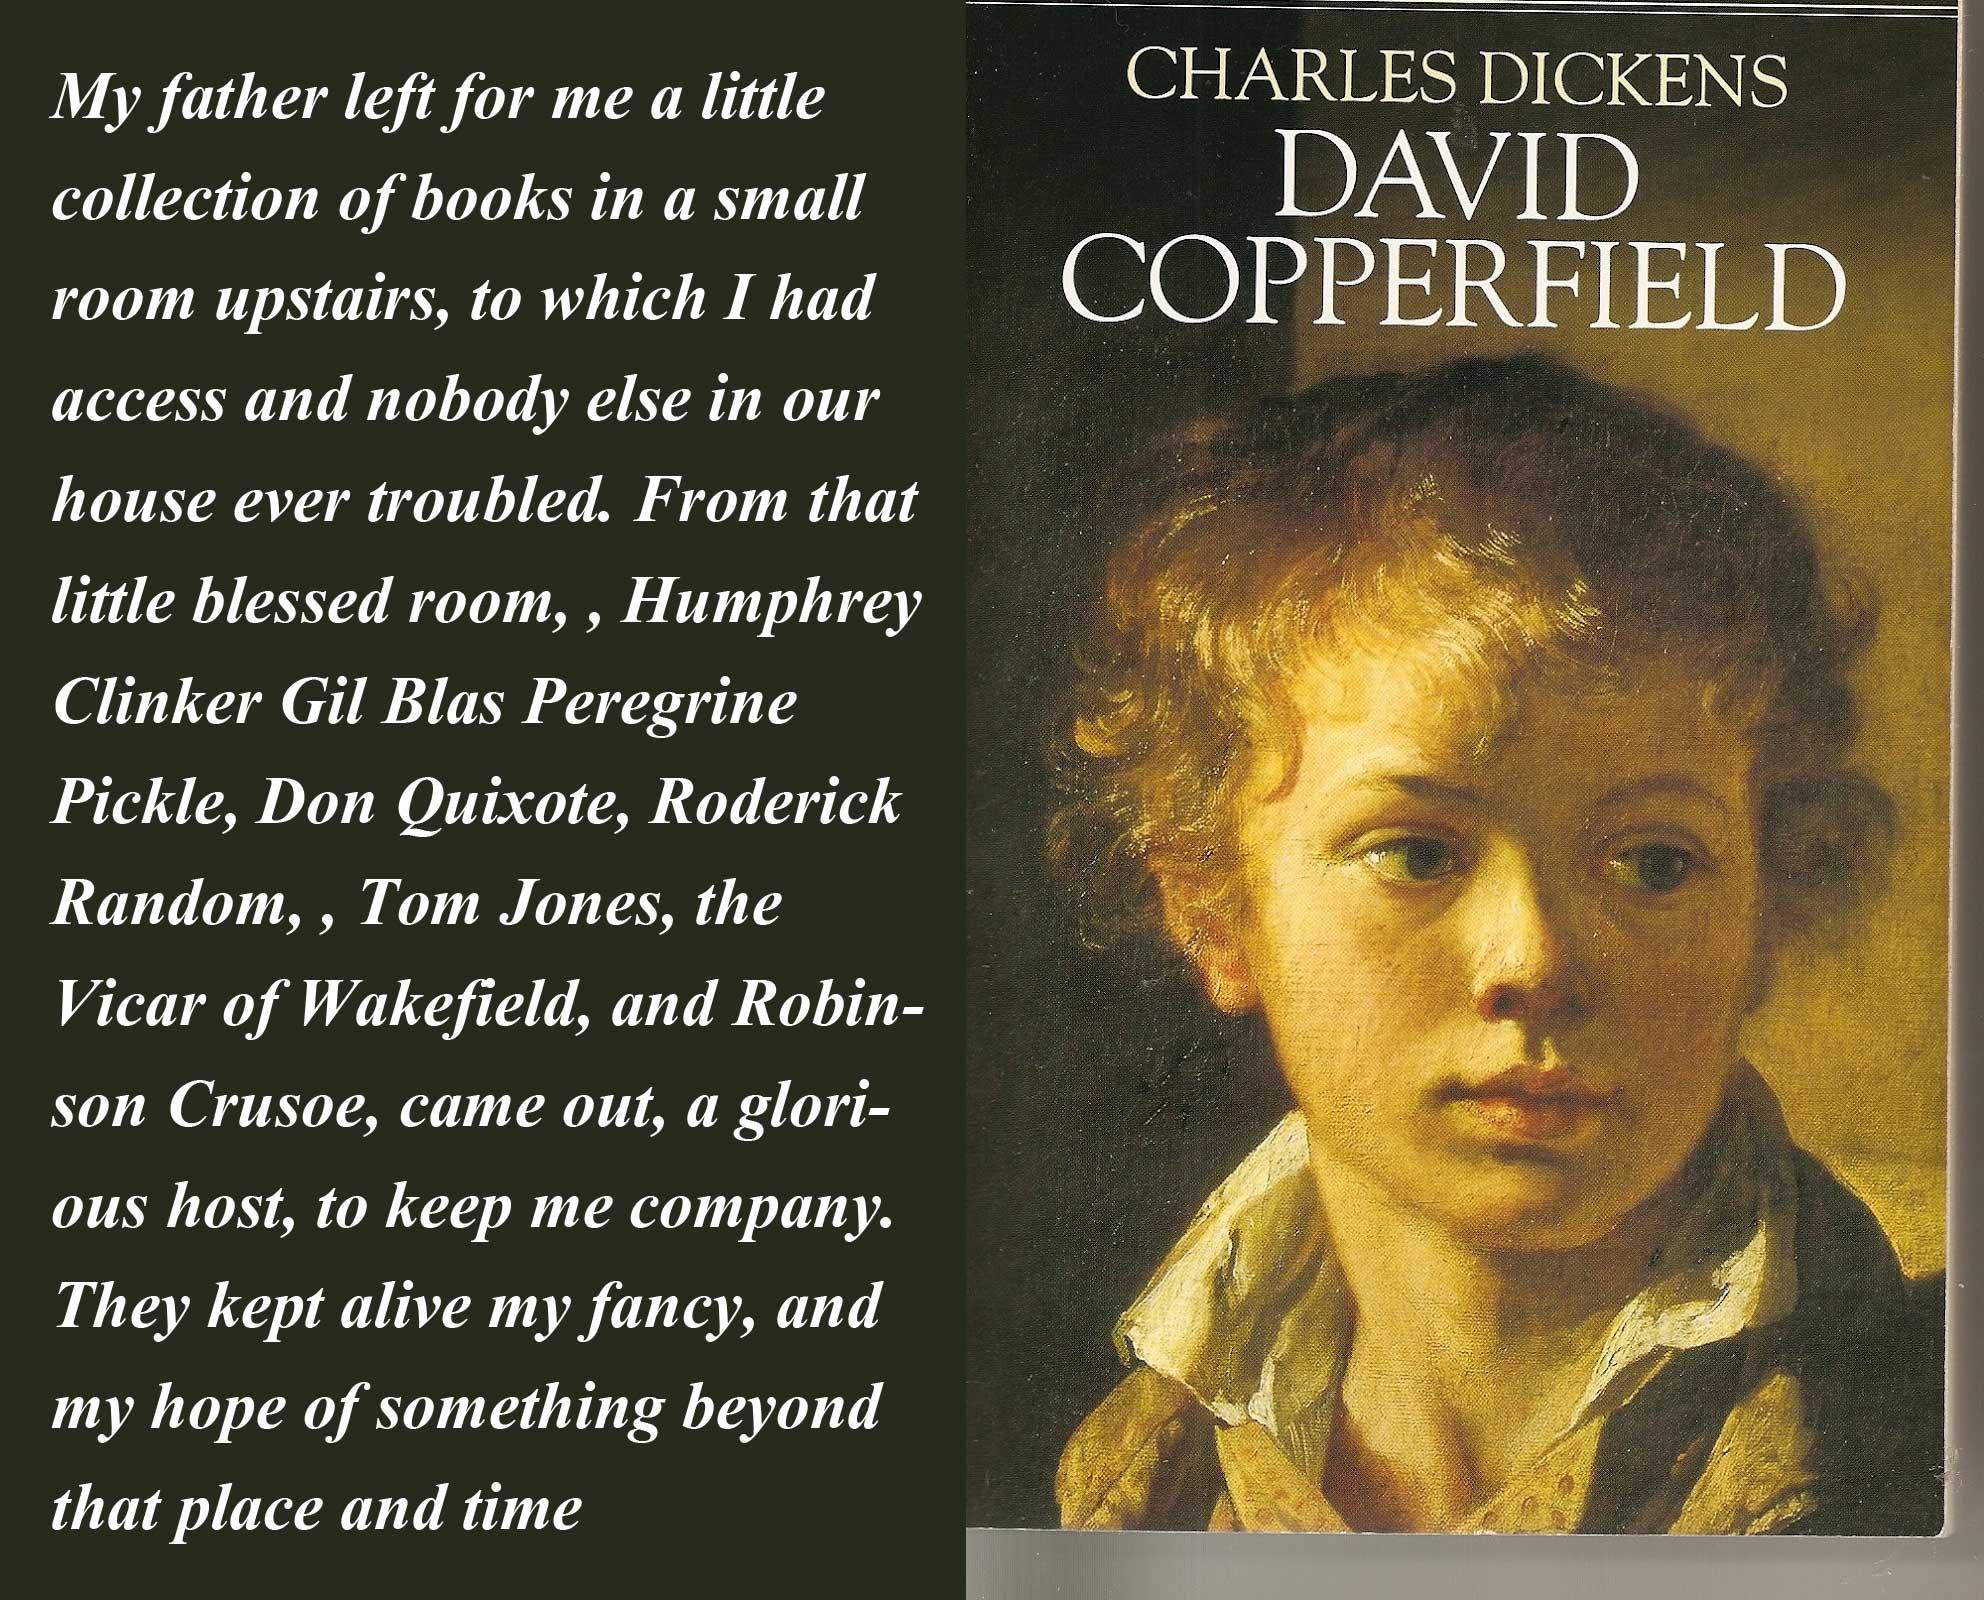 David Copperfield's quote #4